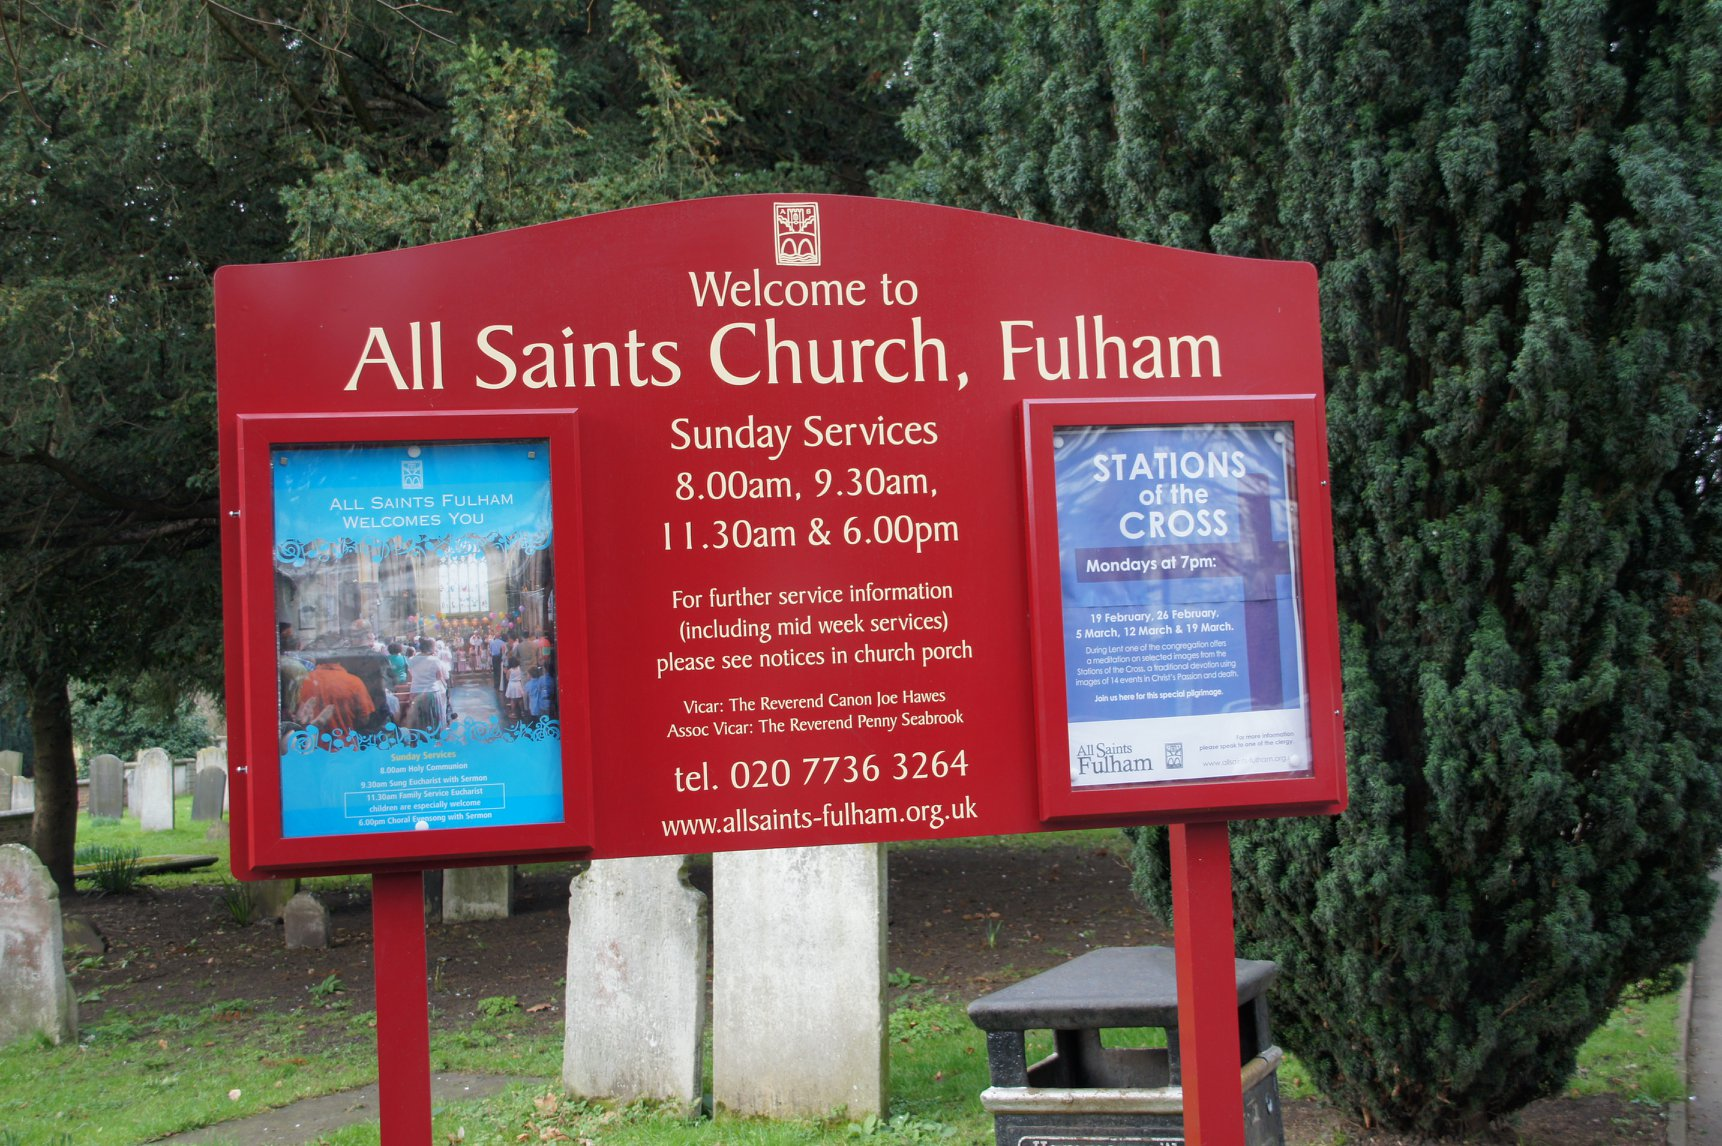 Dan Hinchman - All Saints Fulham sign